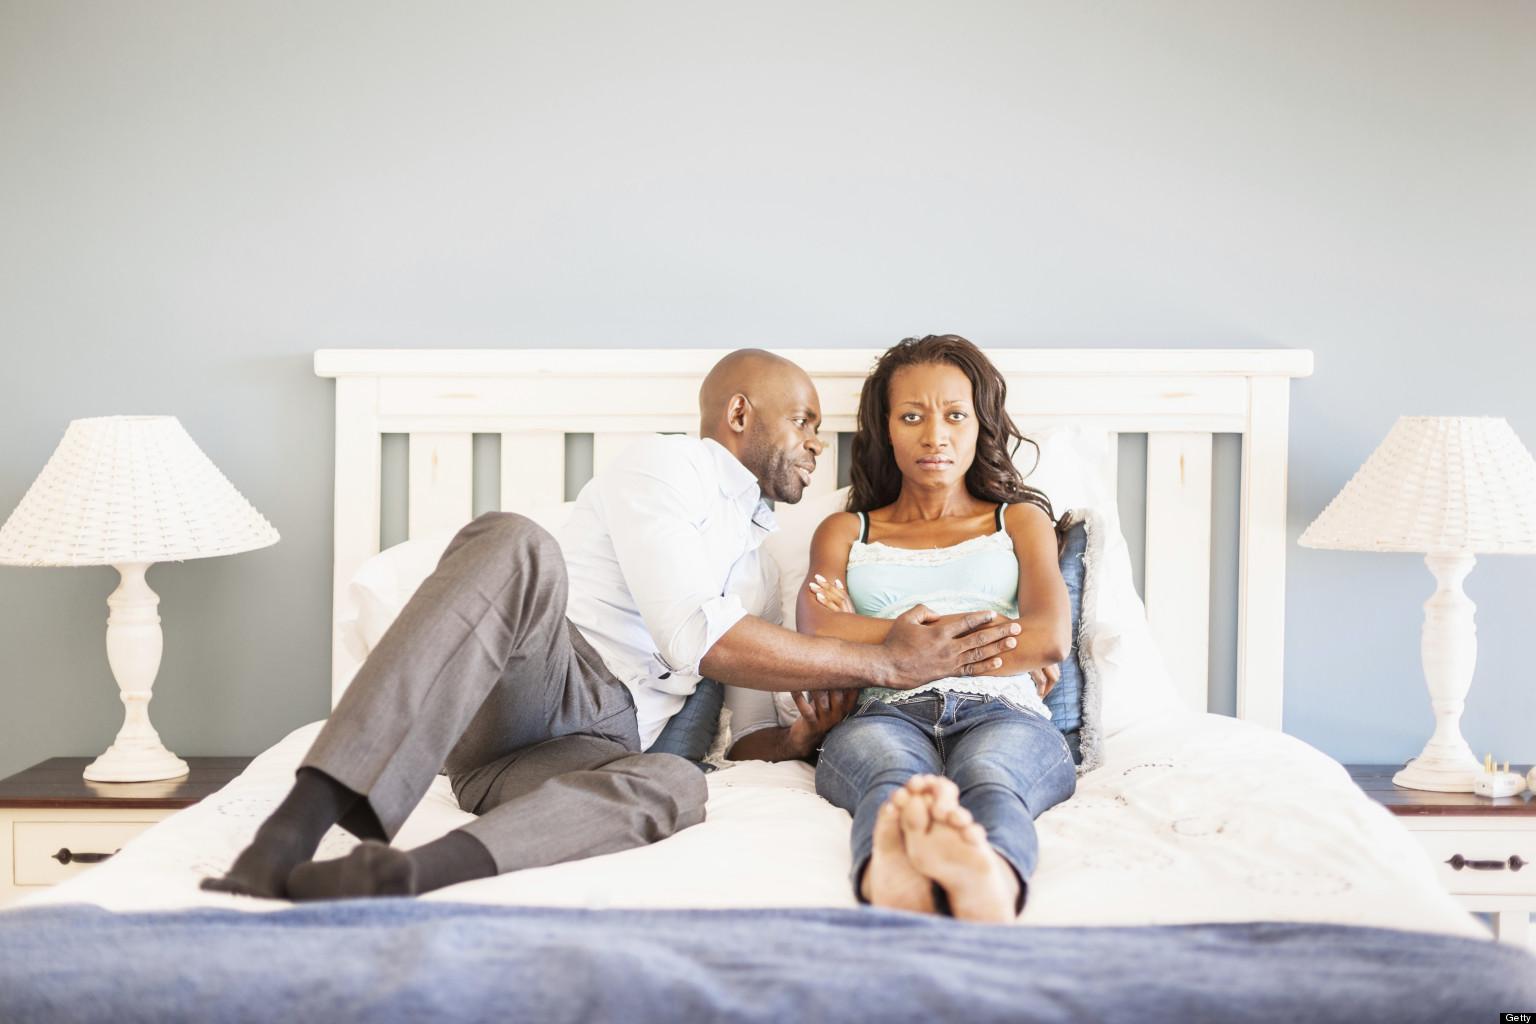 Sleep Science Mattress >> Sleep Study Reveals Couples' Worst Bedtime Habits | HuffPost